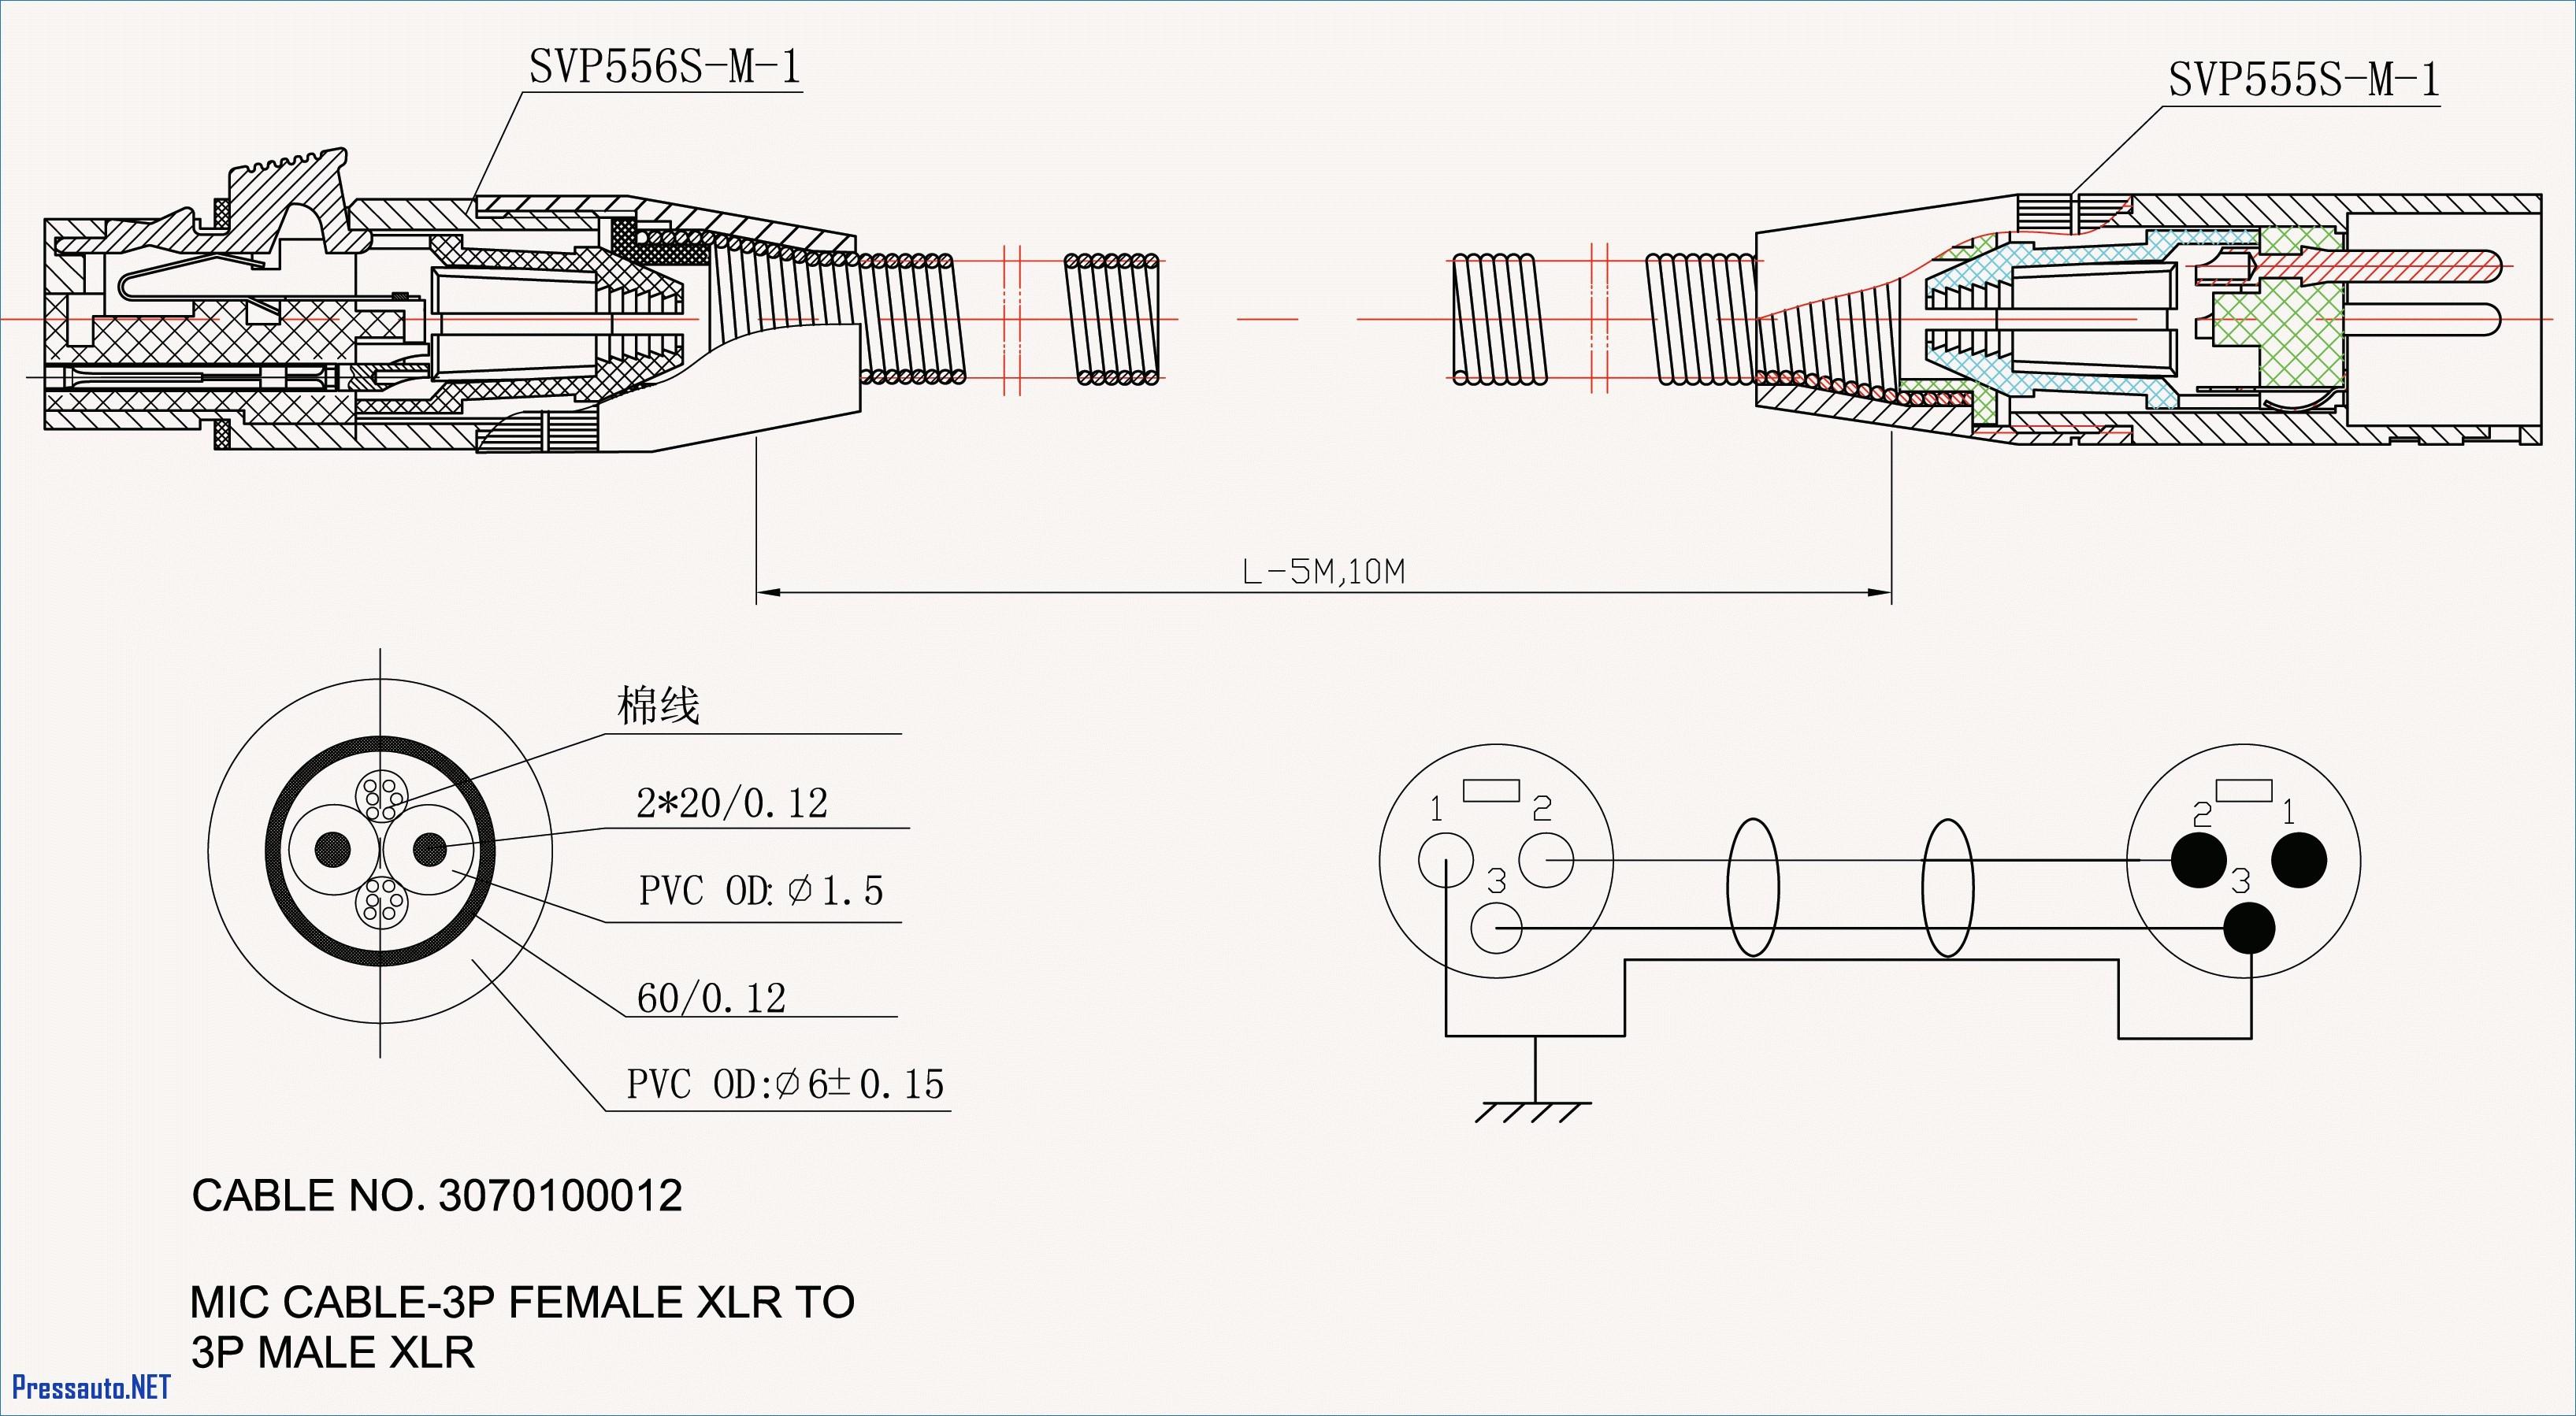 chrysler 3 5 engine diagram 2008 dodge avenger and chrysler cirrus rh detoxicrecenze com